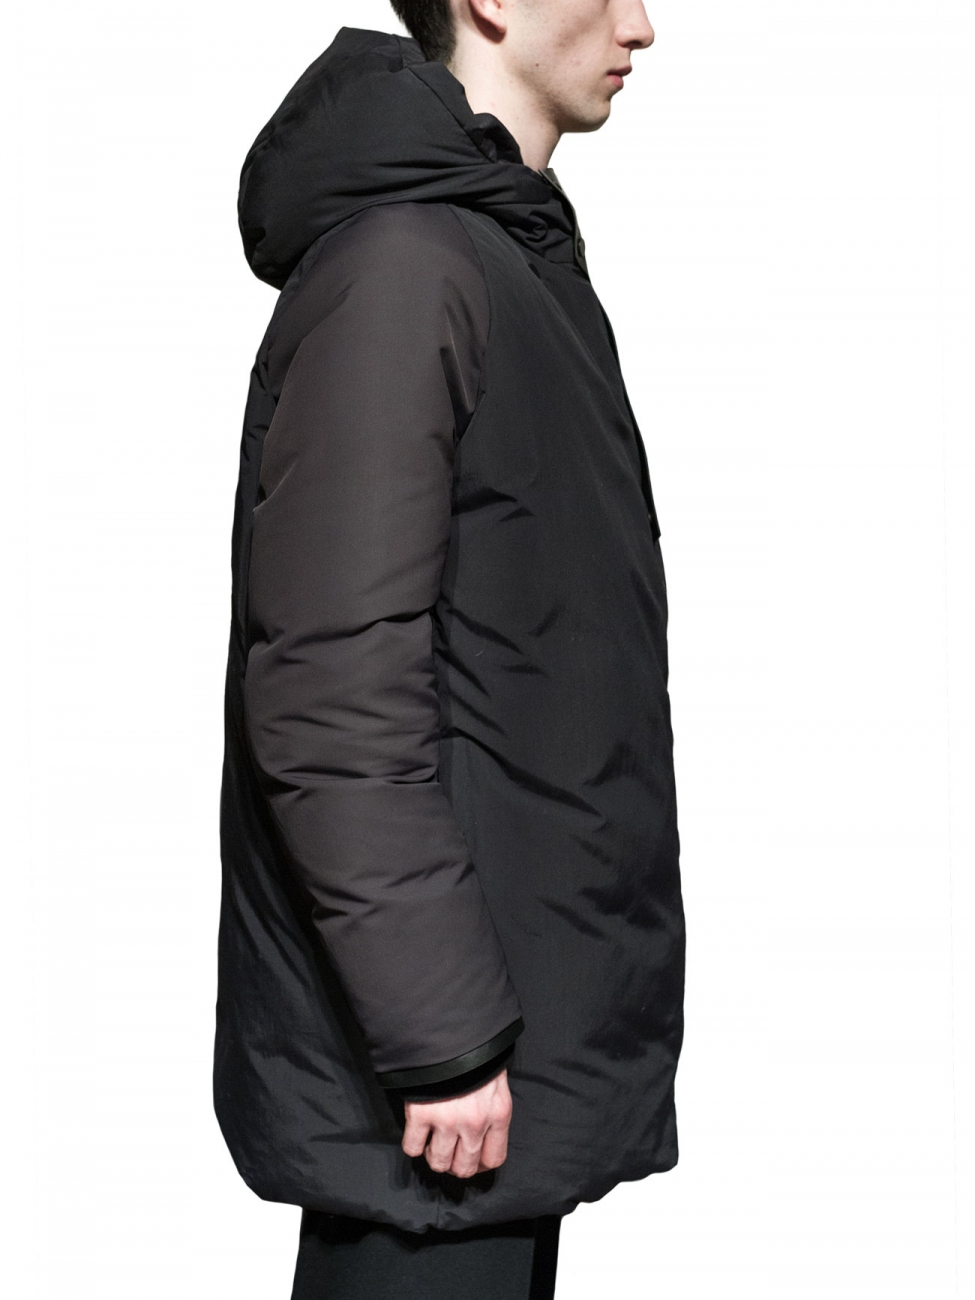 Black Down Jacket Outdoor Jacket